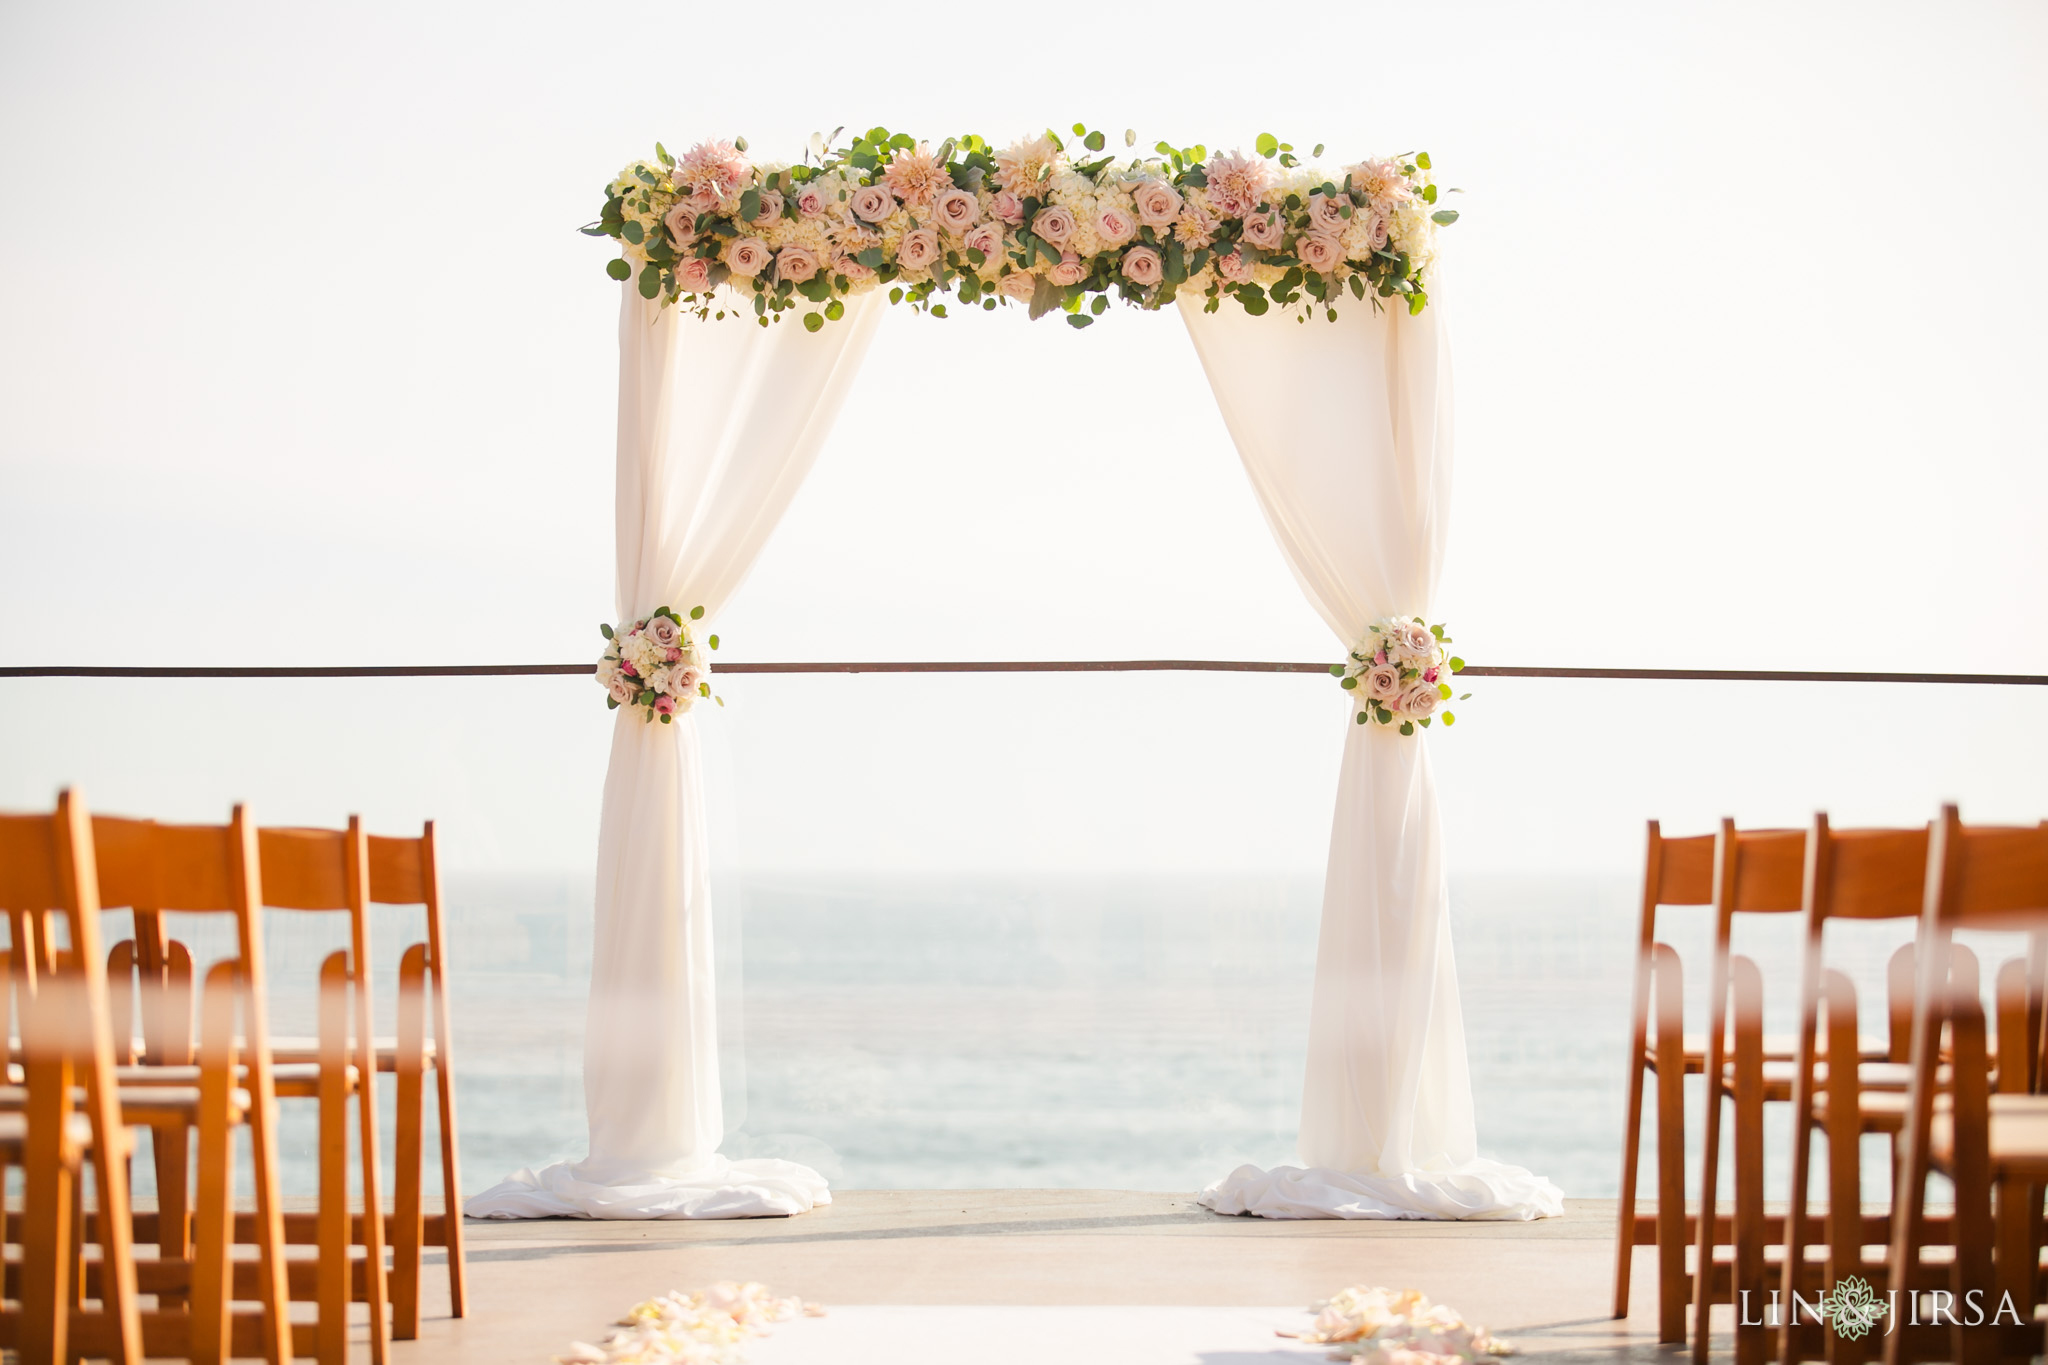 015 surf and sand resort laguna beach wedding photography